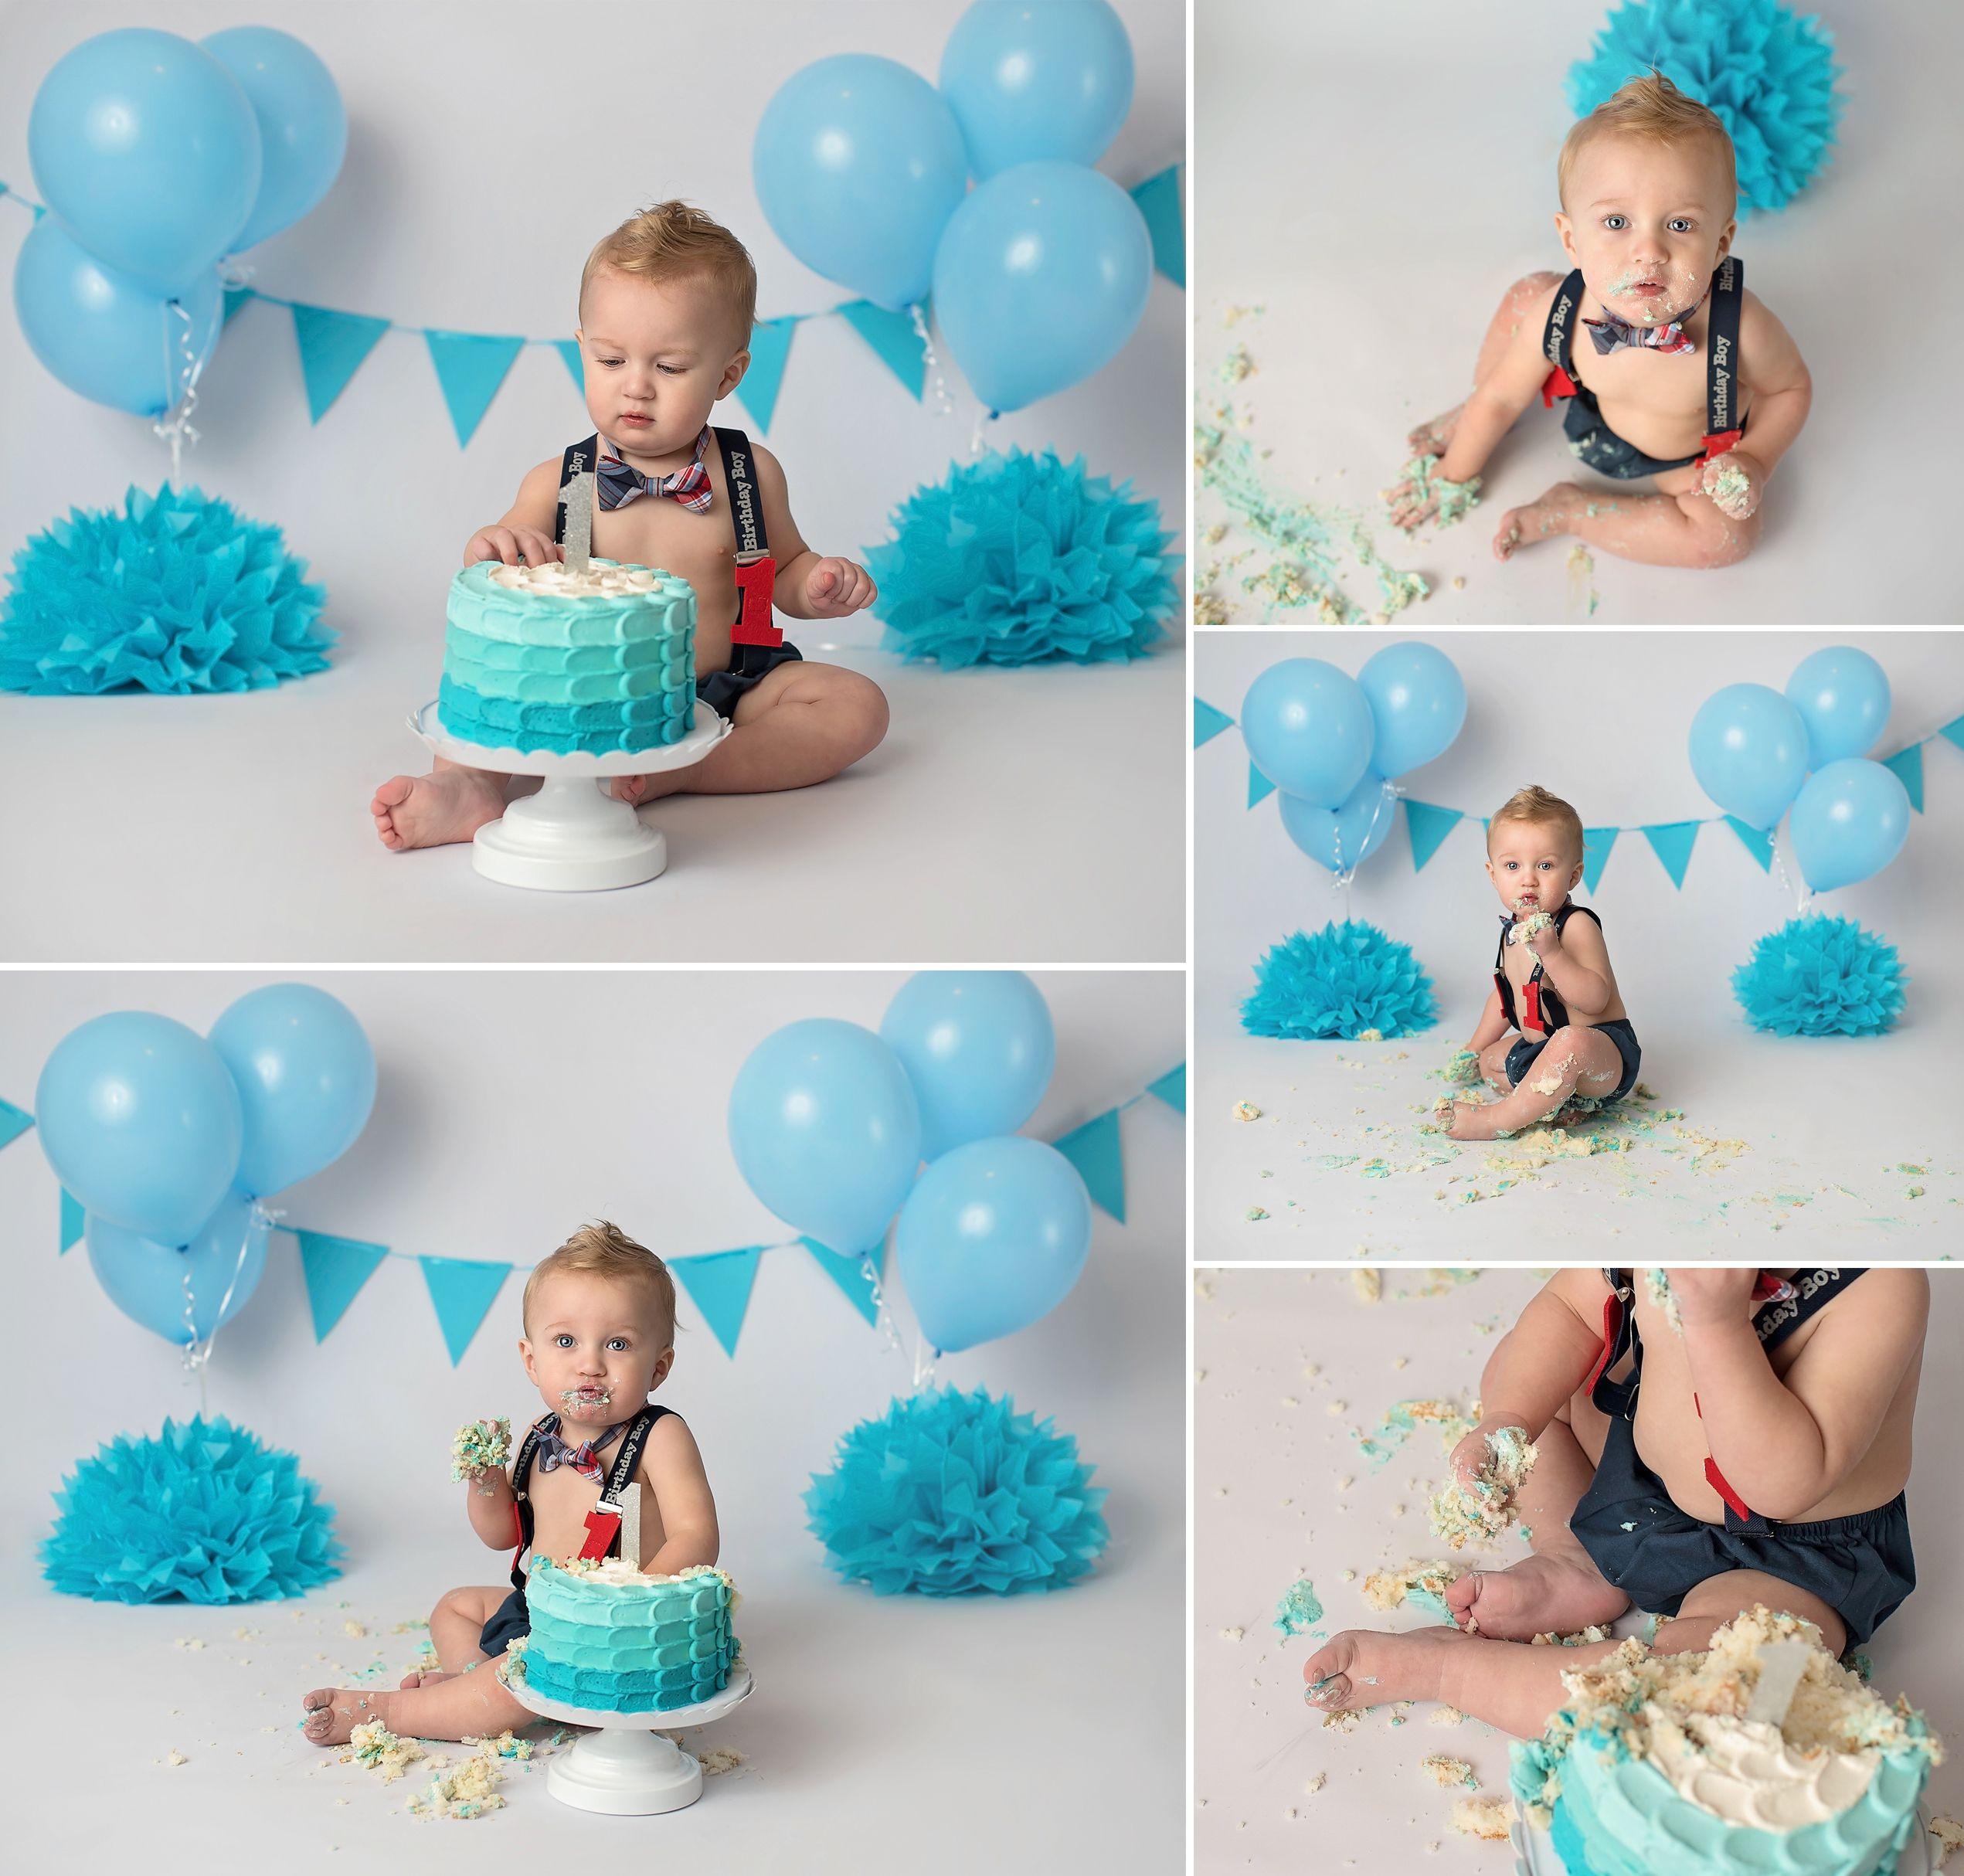 Ideas For A Simple Set Up For A Cake Smash Studio Session Photo Is Done By Tatiana Kahl Photography Boys 1st Birthday Cake Smash Cake Photoshoot Cake Smash Set